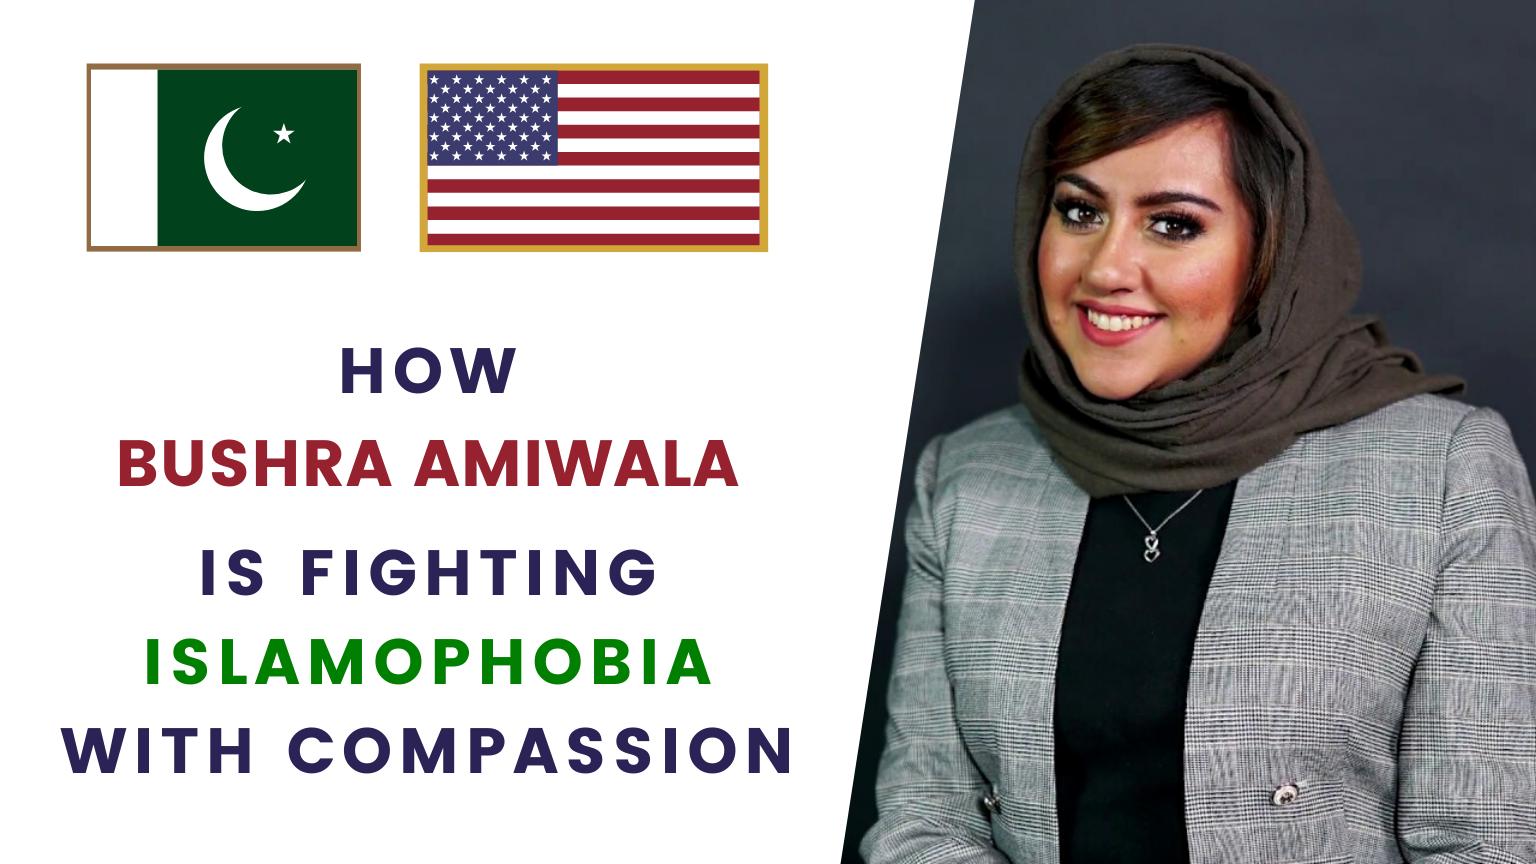 How Bushra Amiwala Is Fighting Islamophobia With Compassion